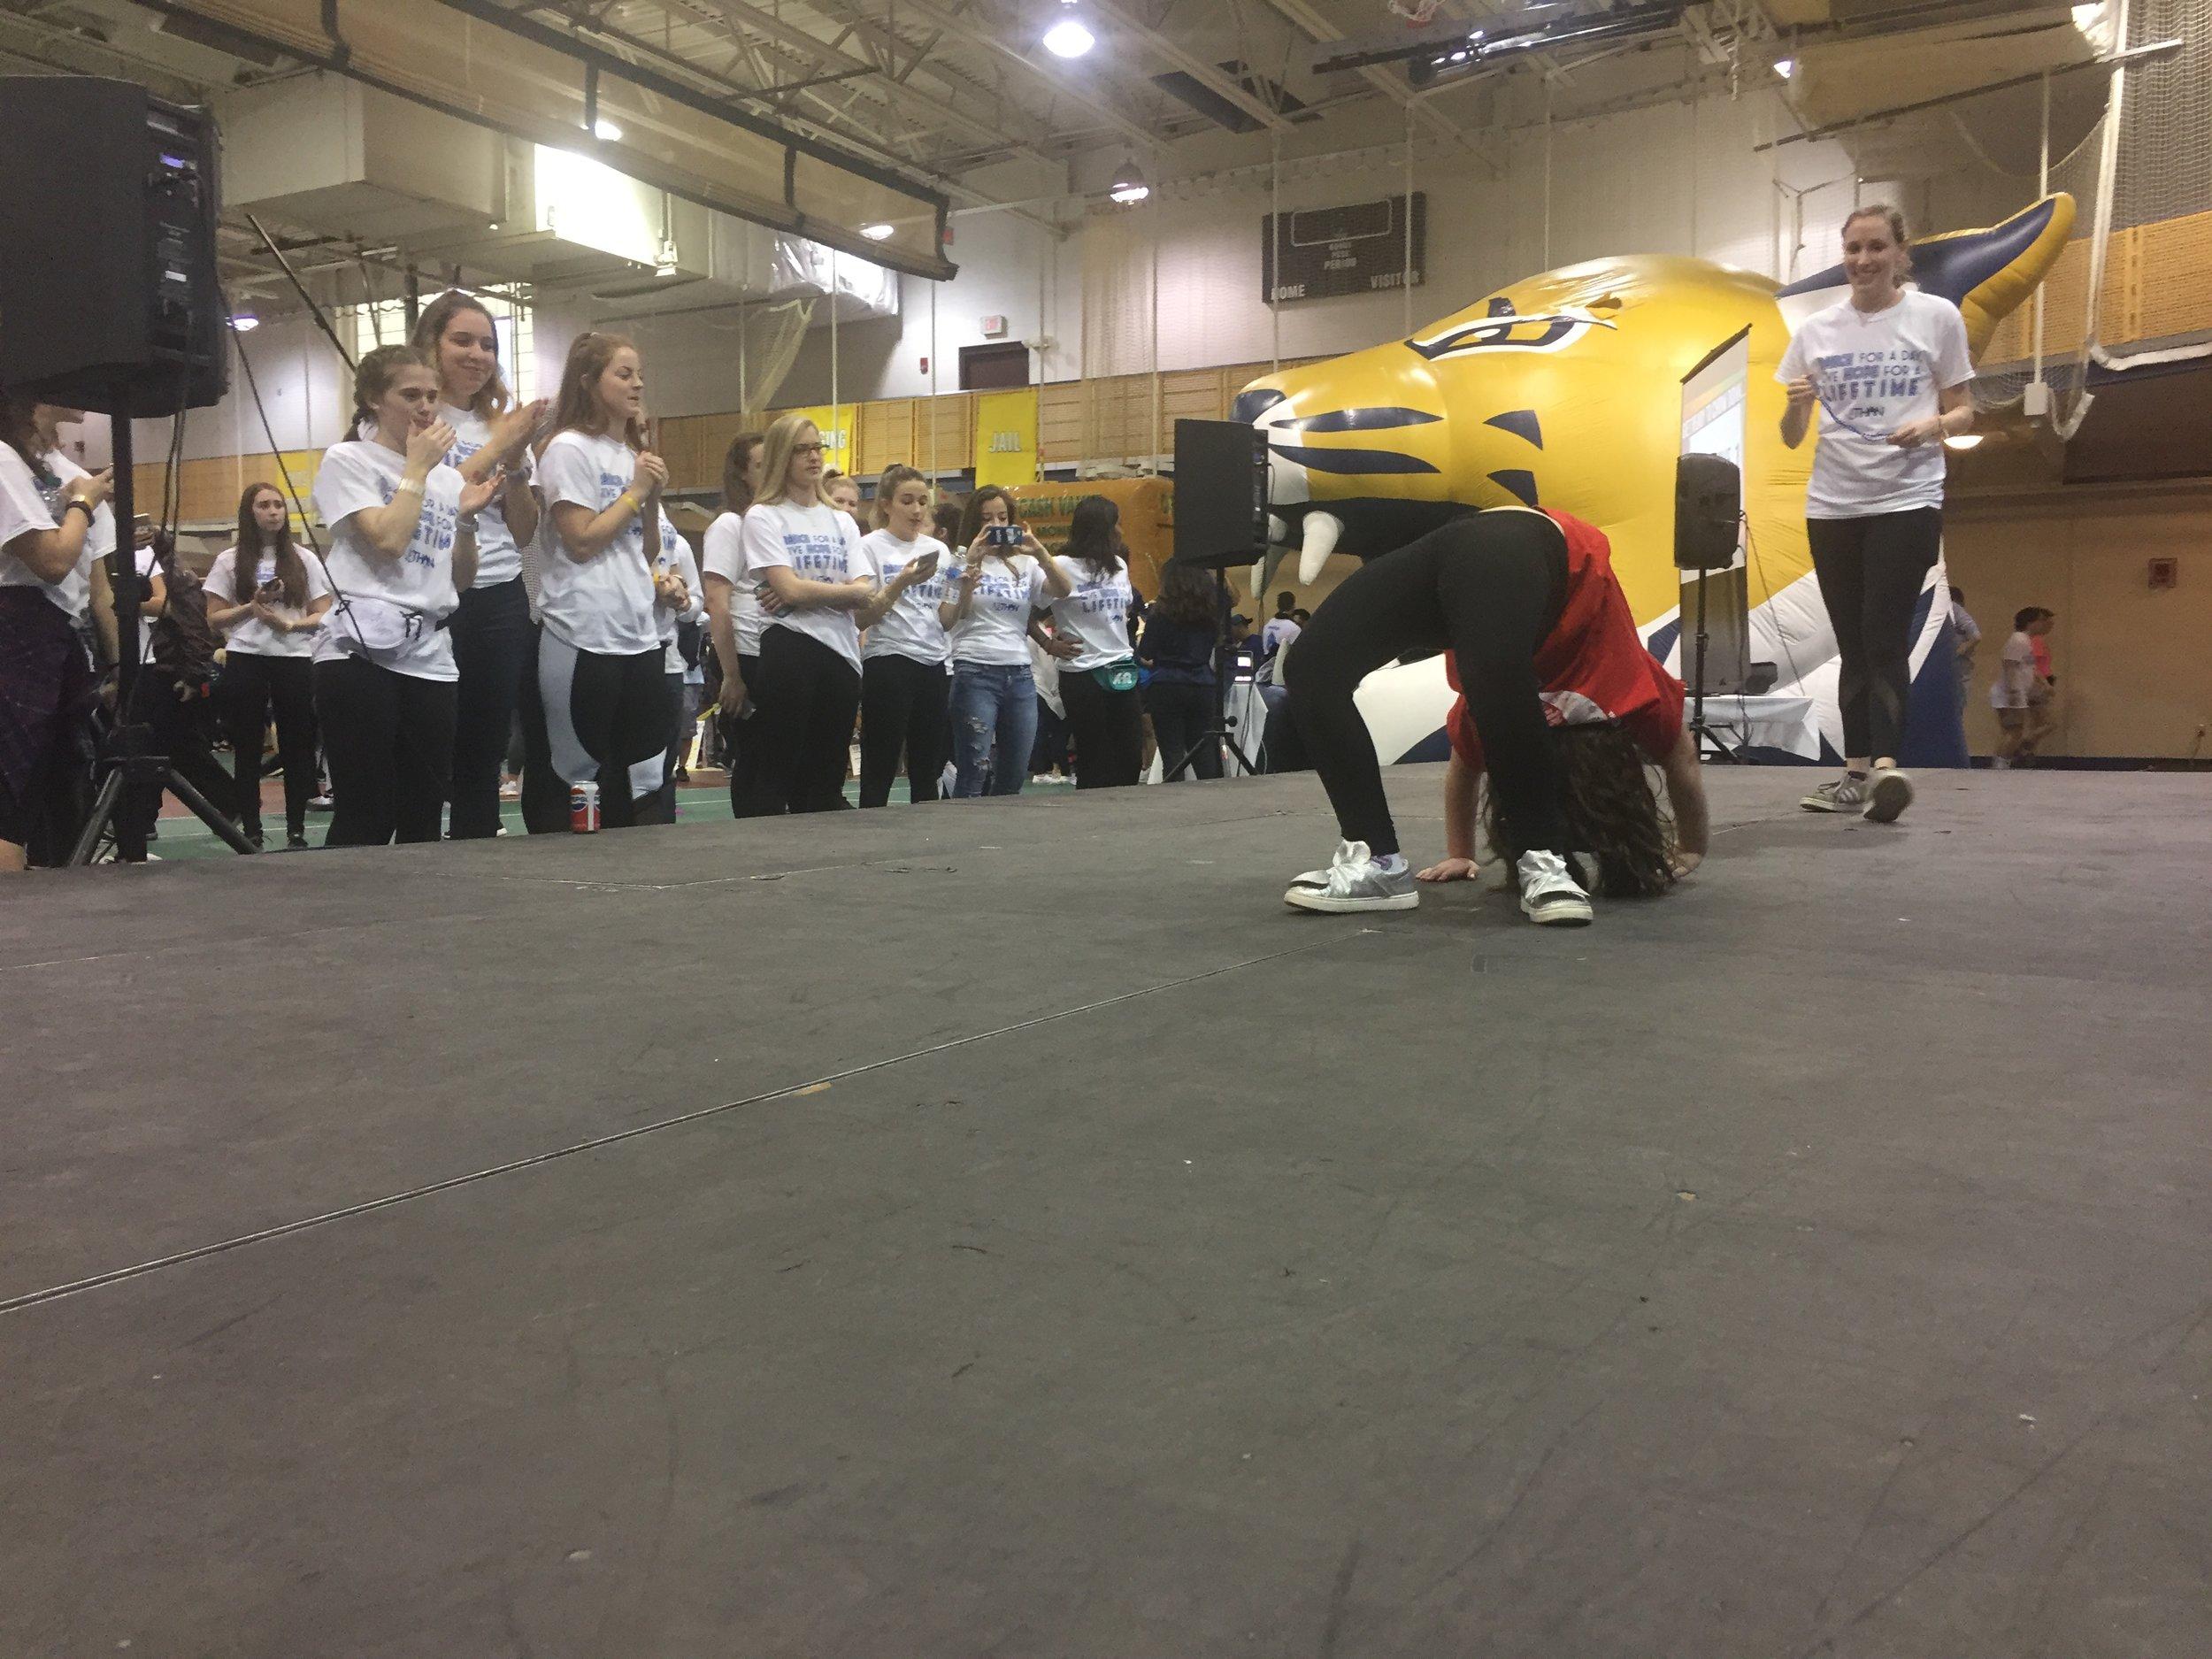 Miracle Child, Bianca, shows off her gymnastics skills at the 2018 QTHON dance marathon